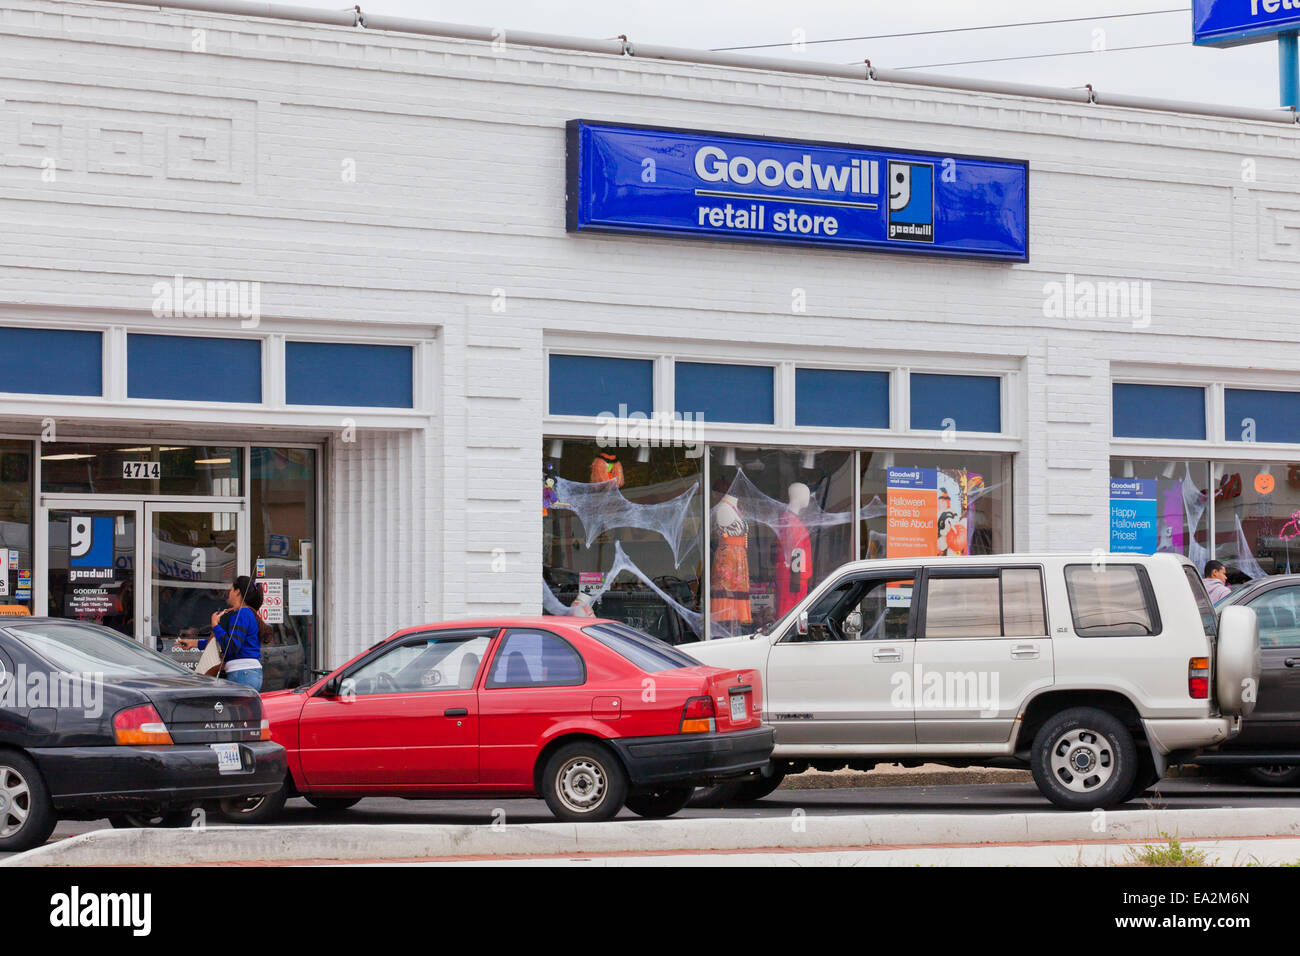 Goodwill store - USA - Stock Image